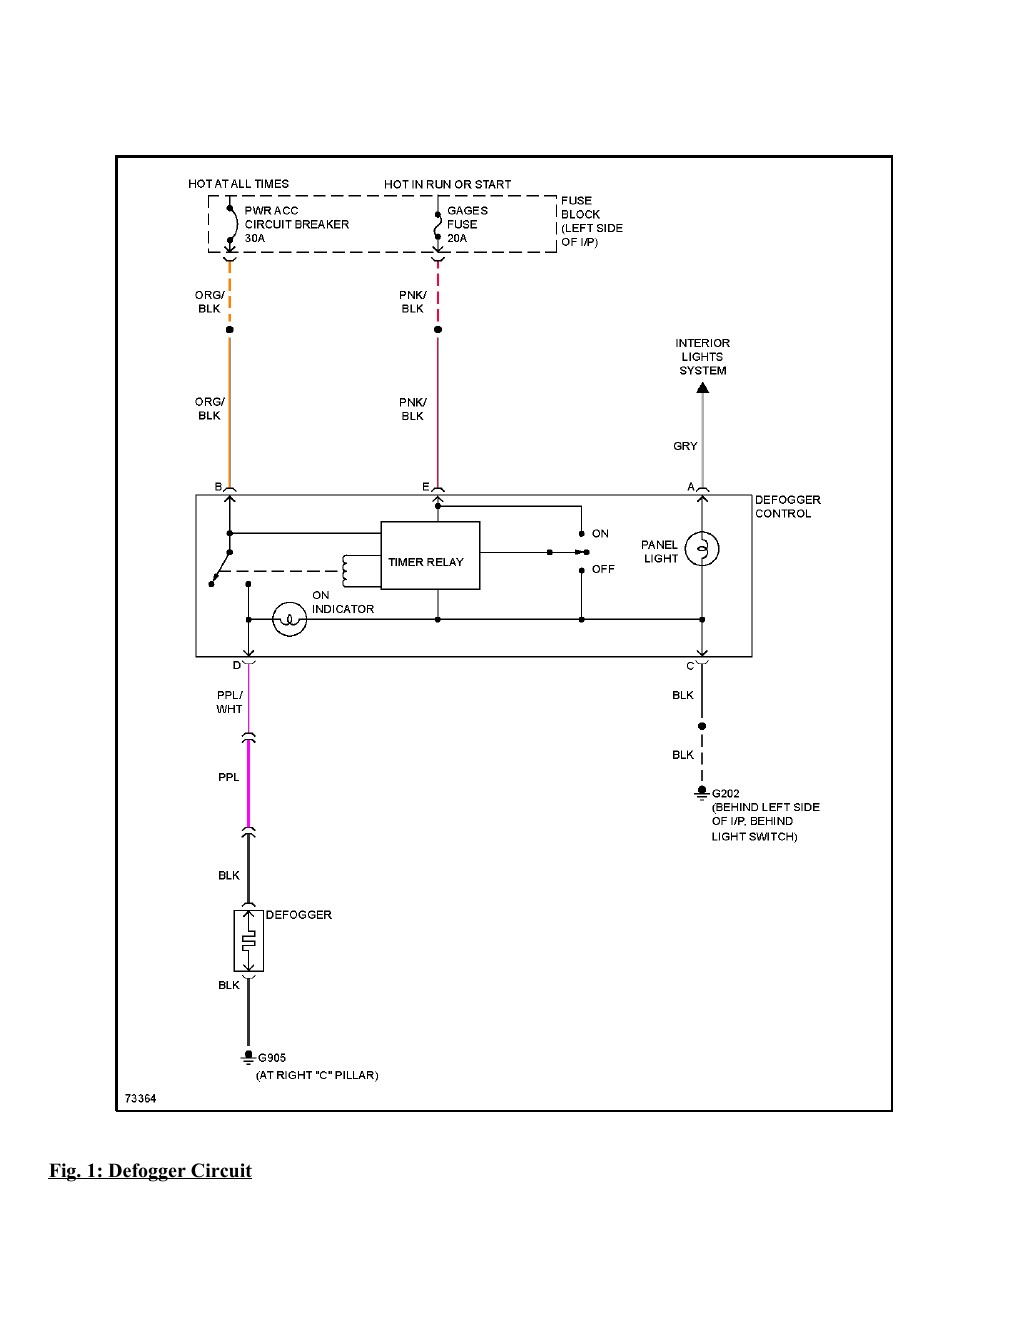 medium resolution of 1995 chevrolet monte carlo ss complete wiring diagram part 1999 monte carlo wiring diagram 1999 monte